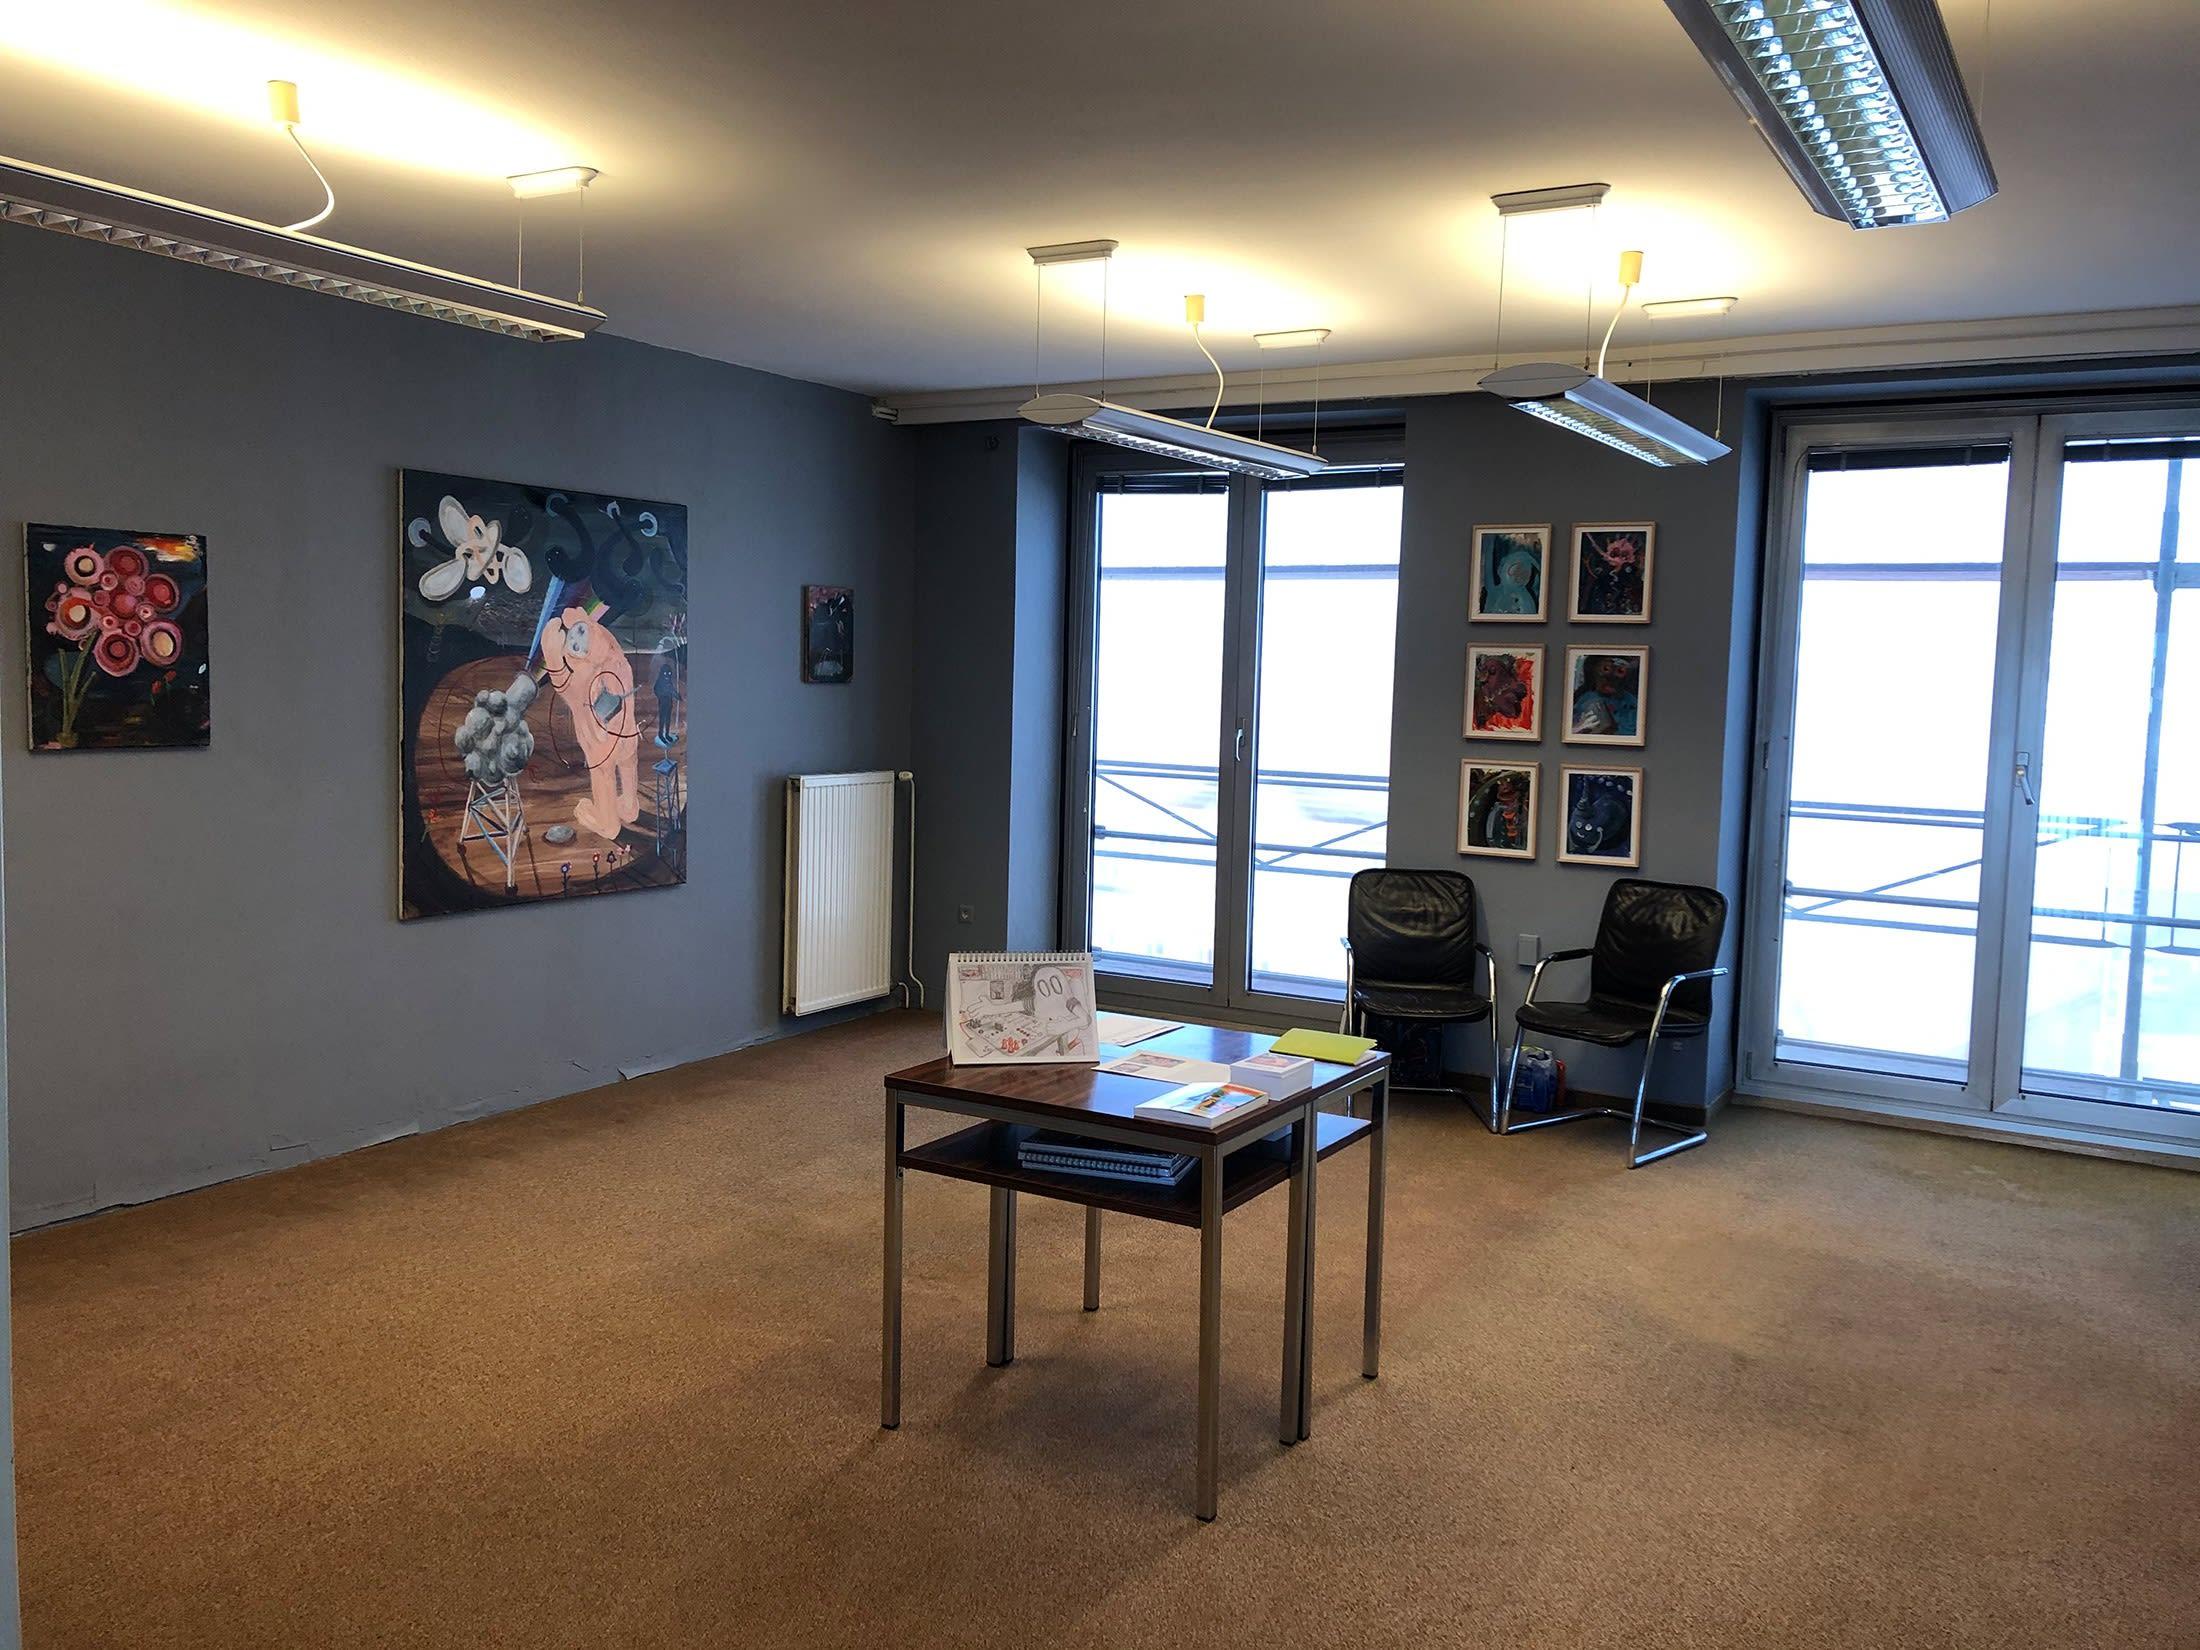 parallel vienna, explore contemporary art in vienna